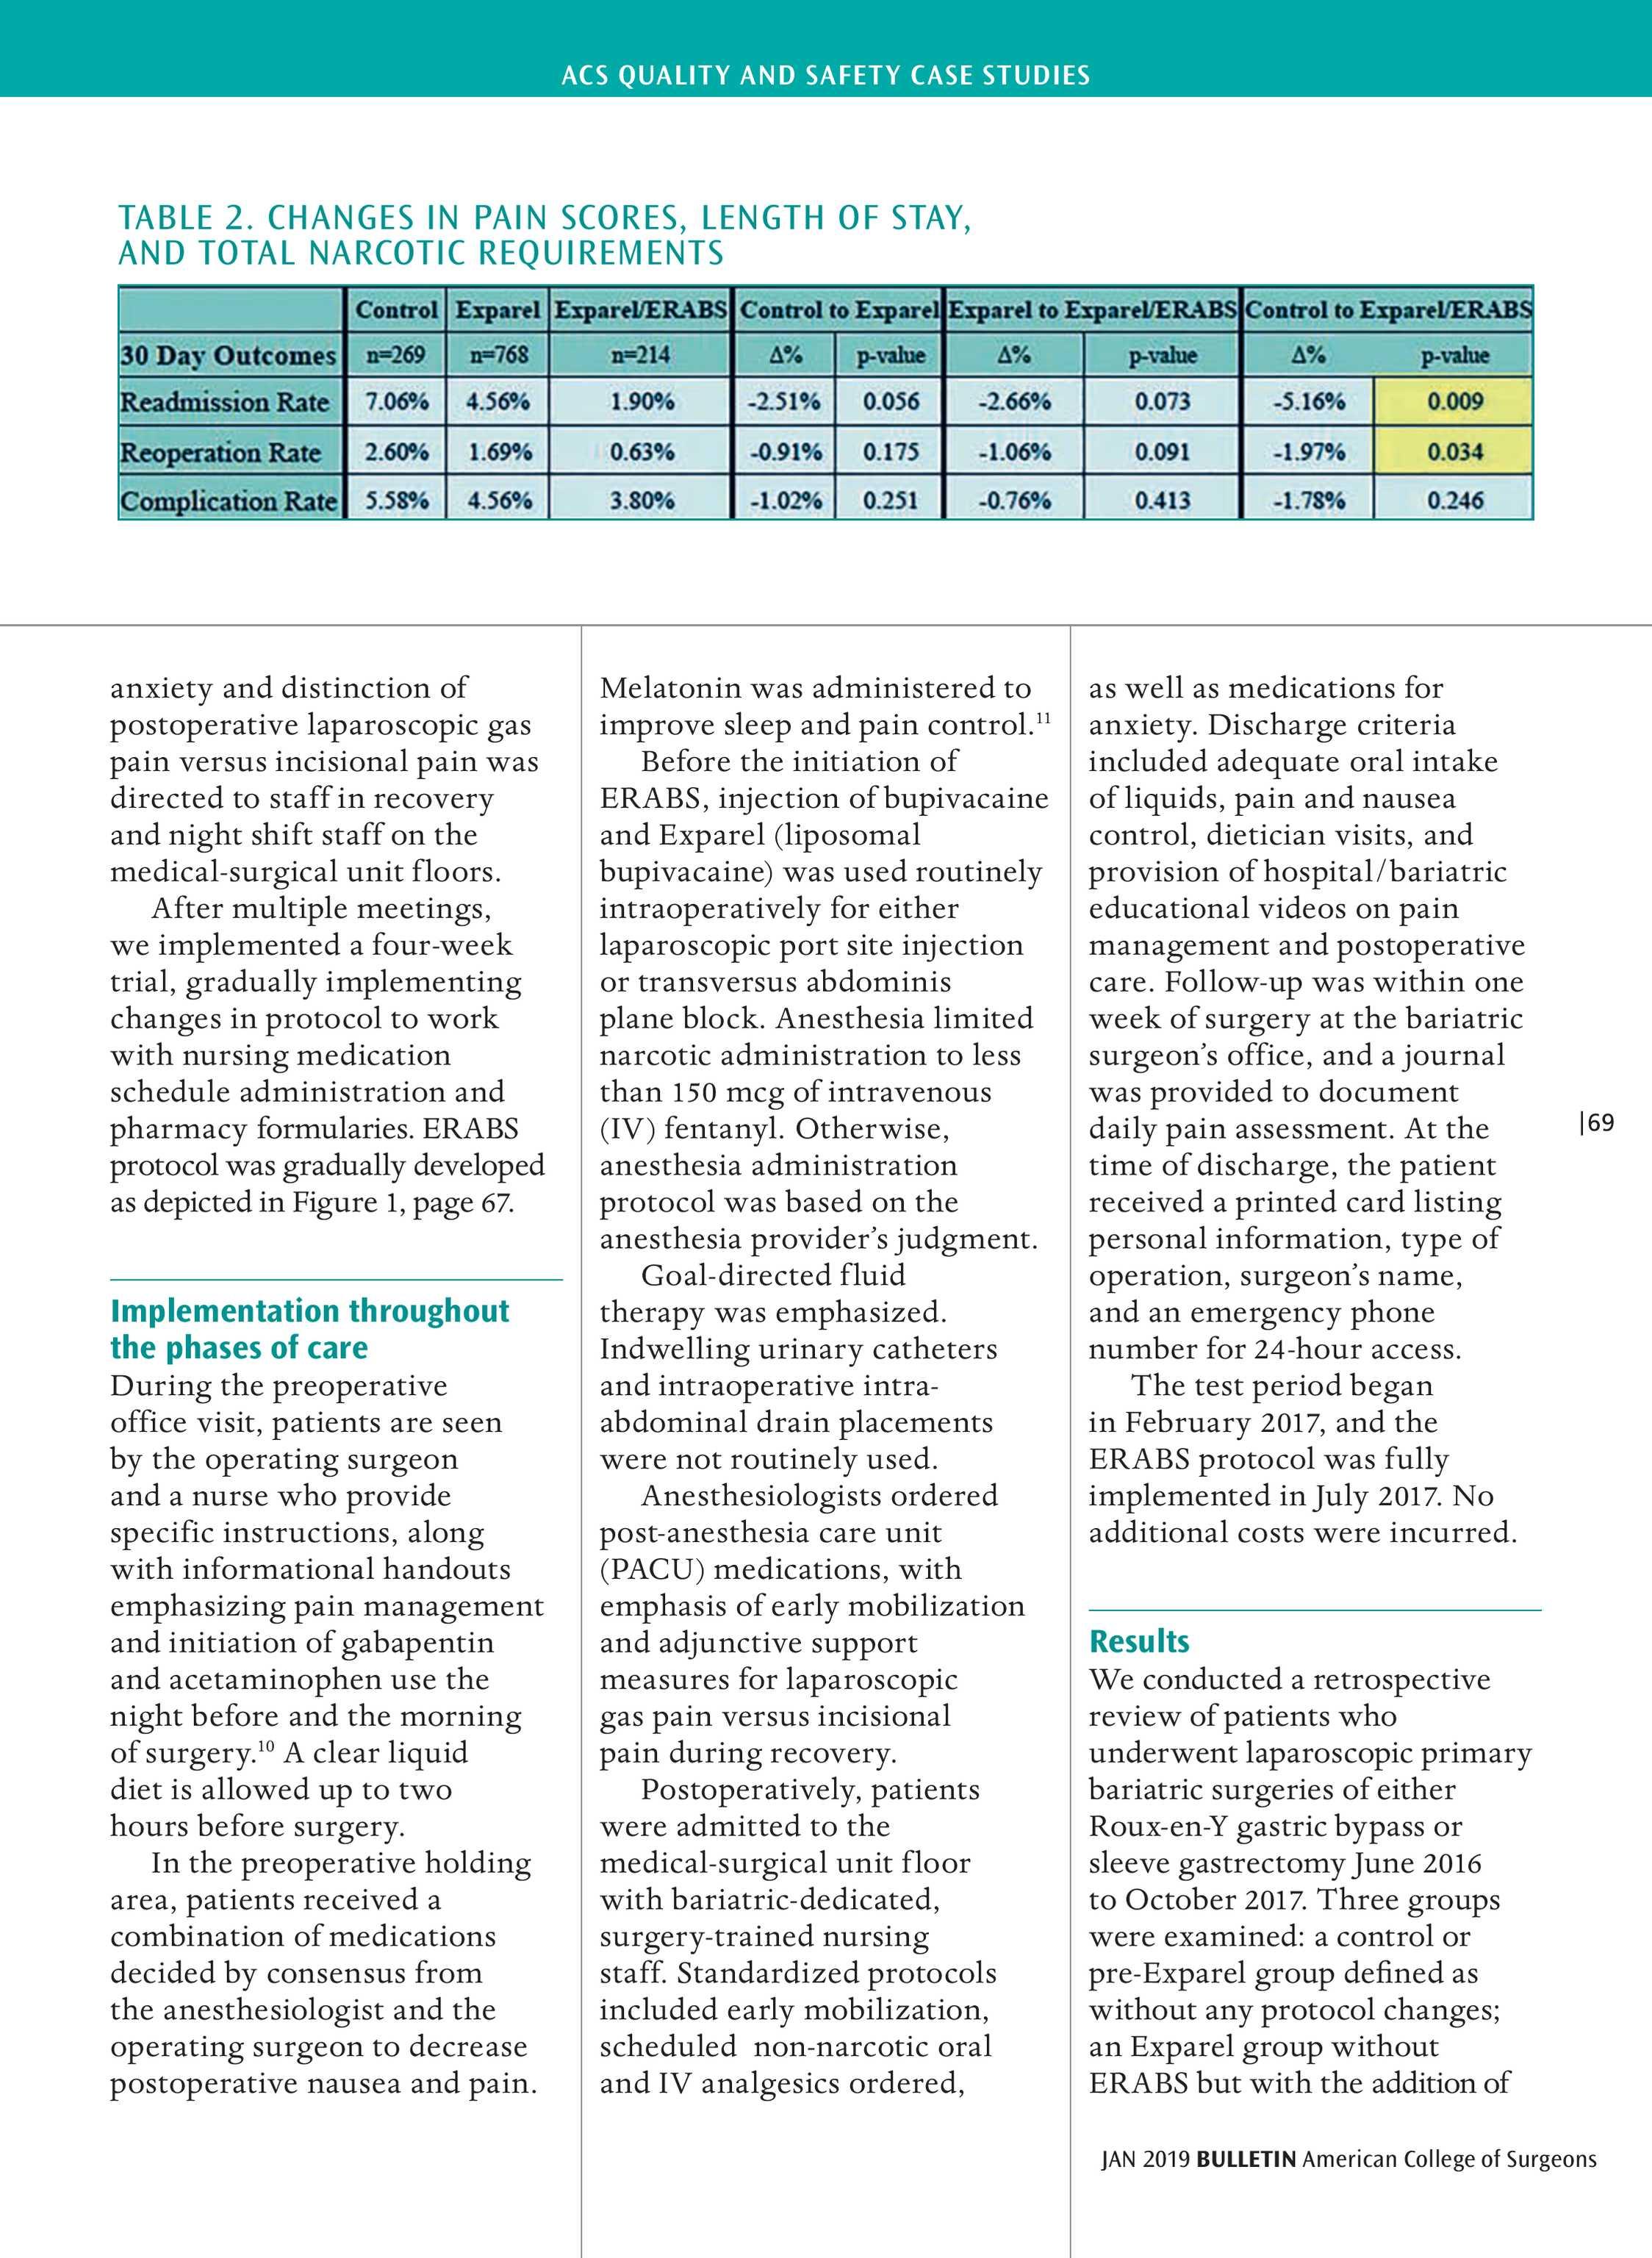 ACS Bulletin - February 2019 - page 69